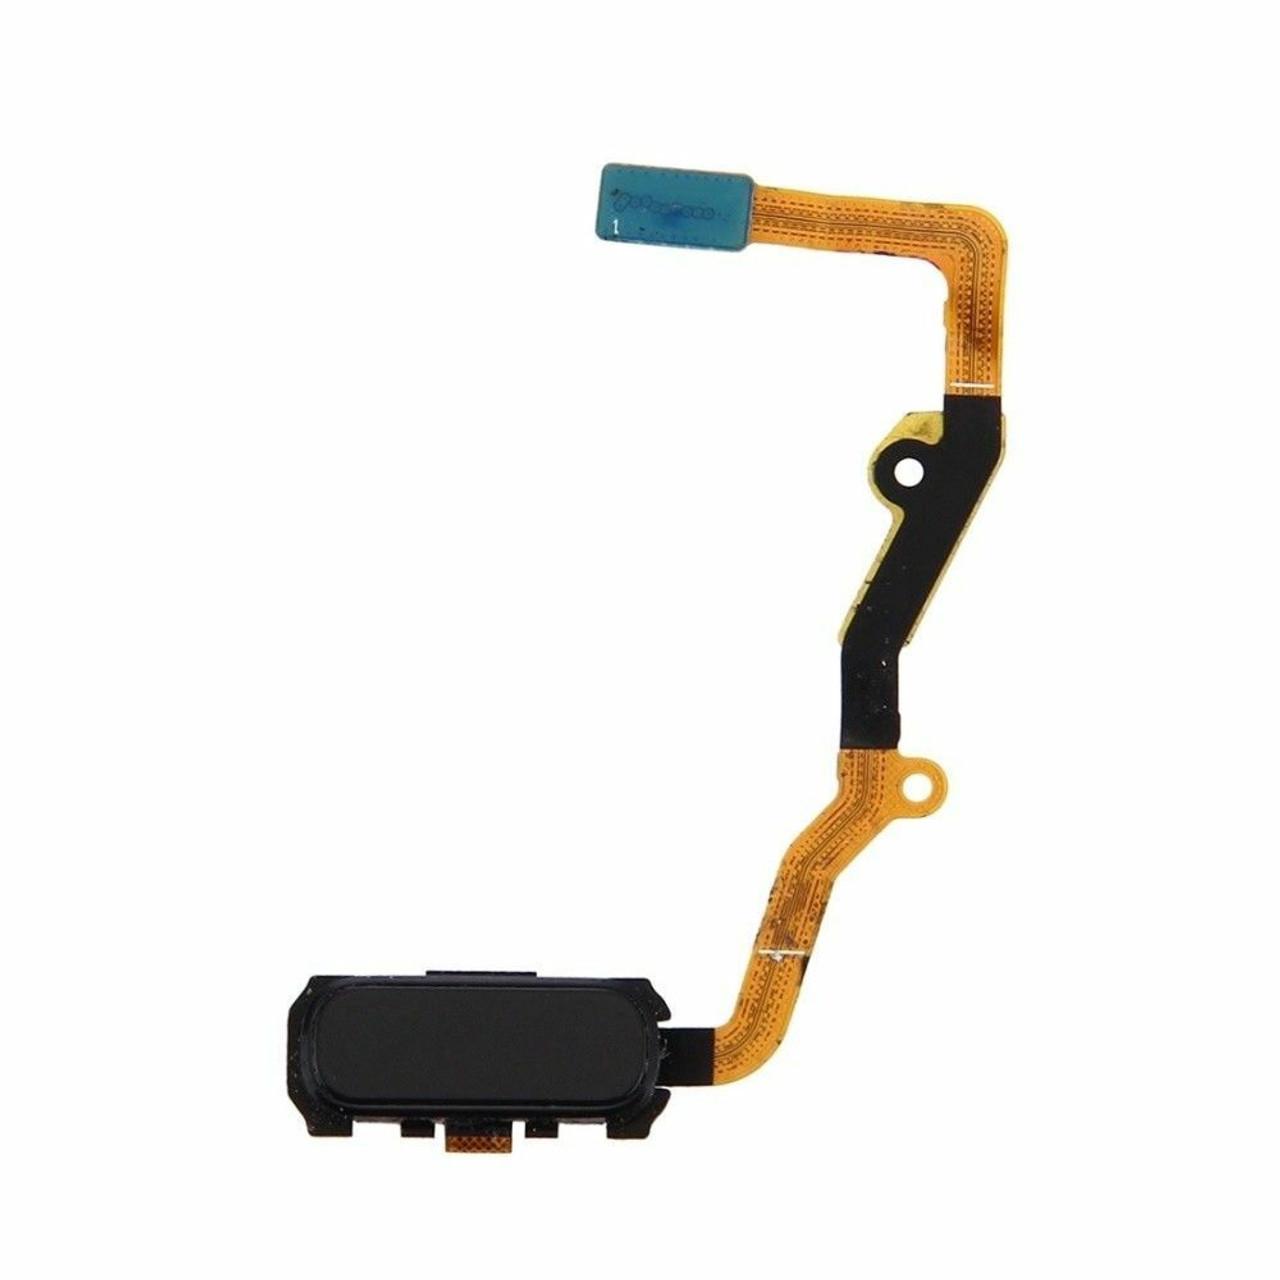 OEM Home Button Fingerprint Sensor Flex Cable For Samsung Galaxy S7 G930 New USA